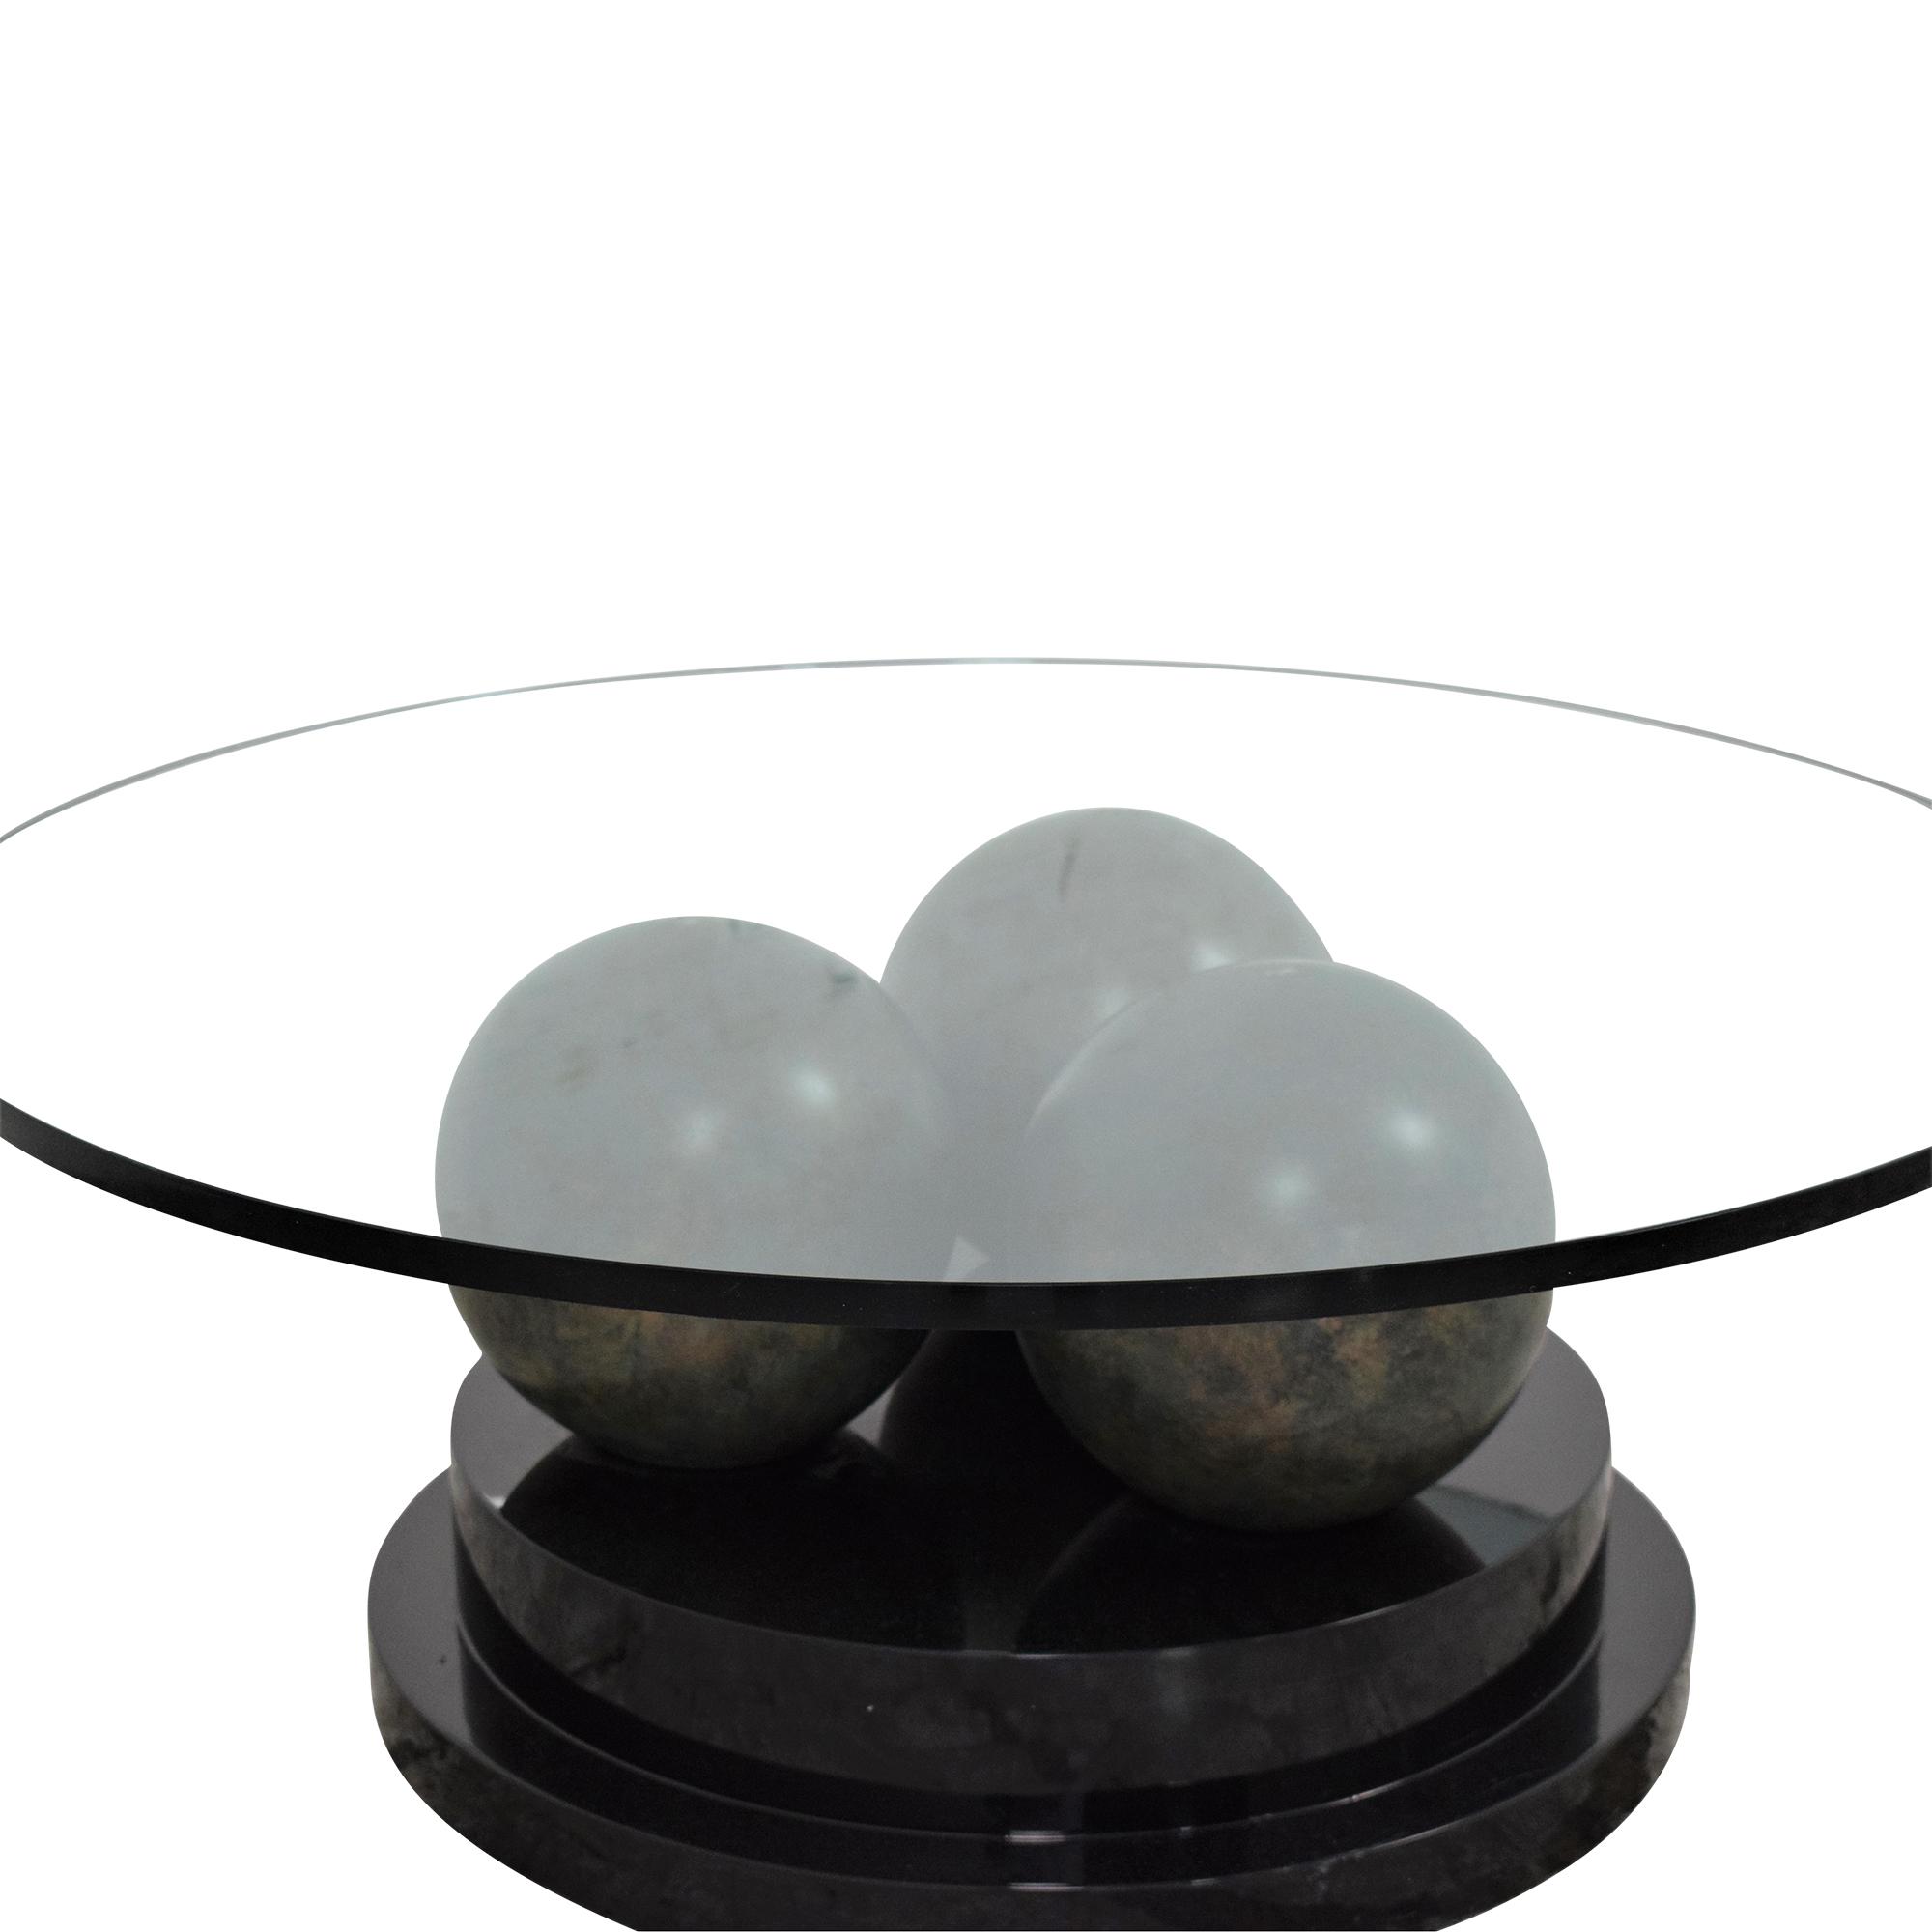 Directional Furniture Directional Furniture Glass Coffee Table nyc